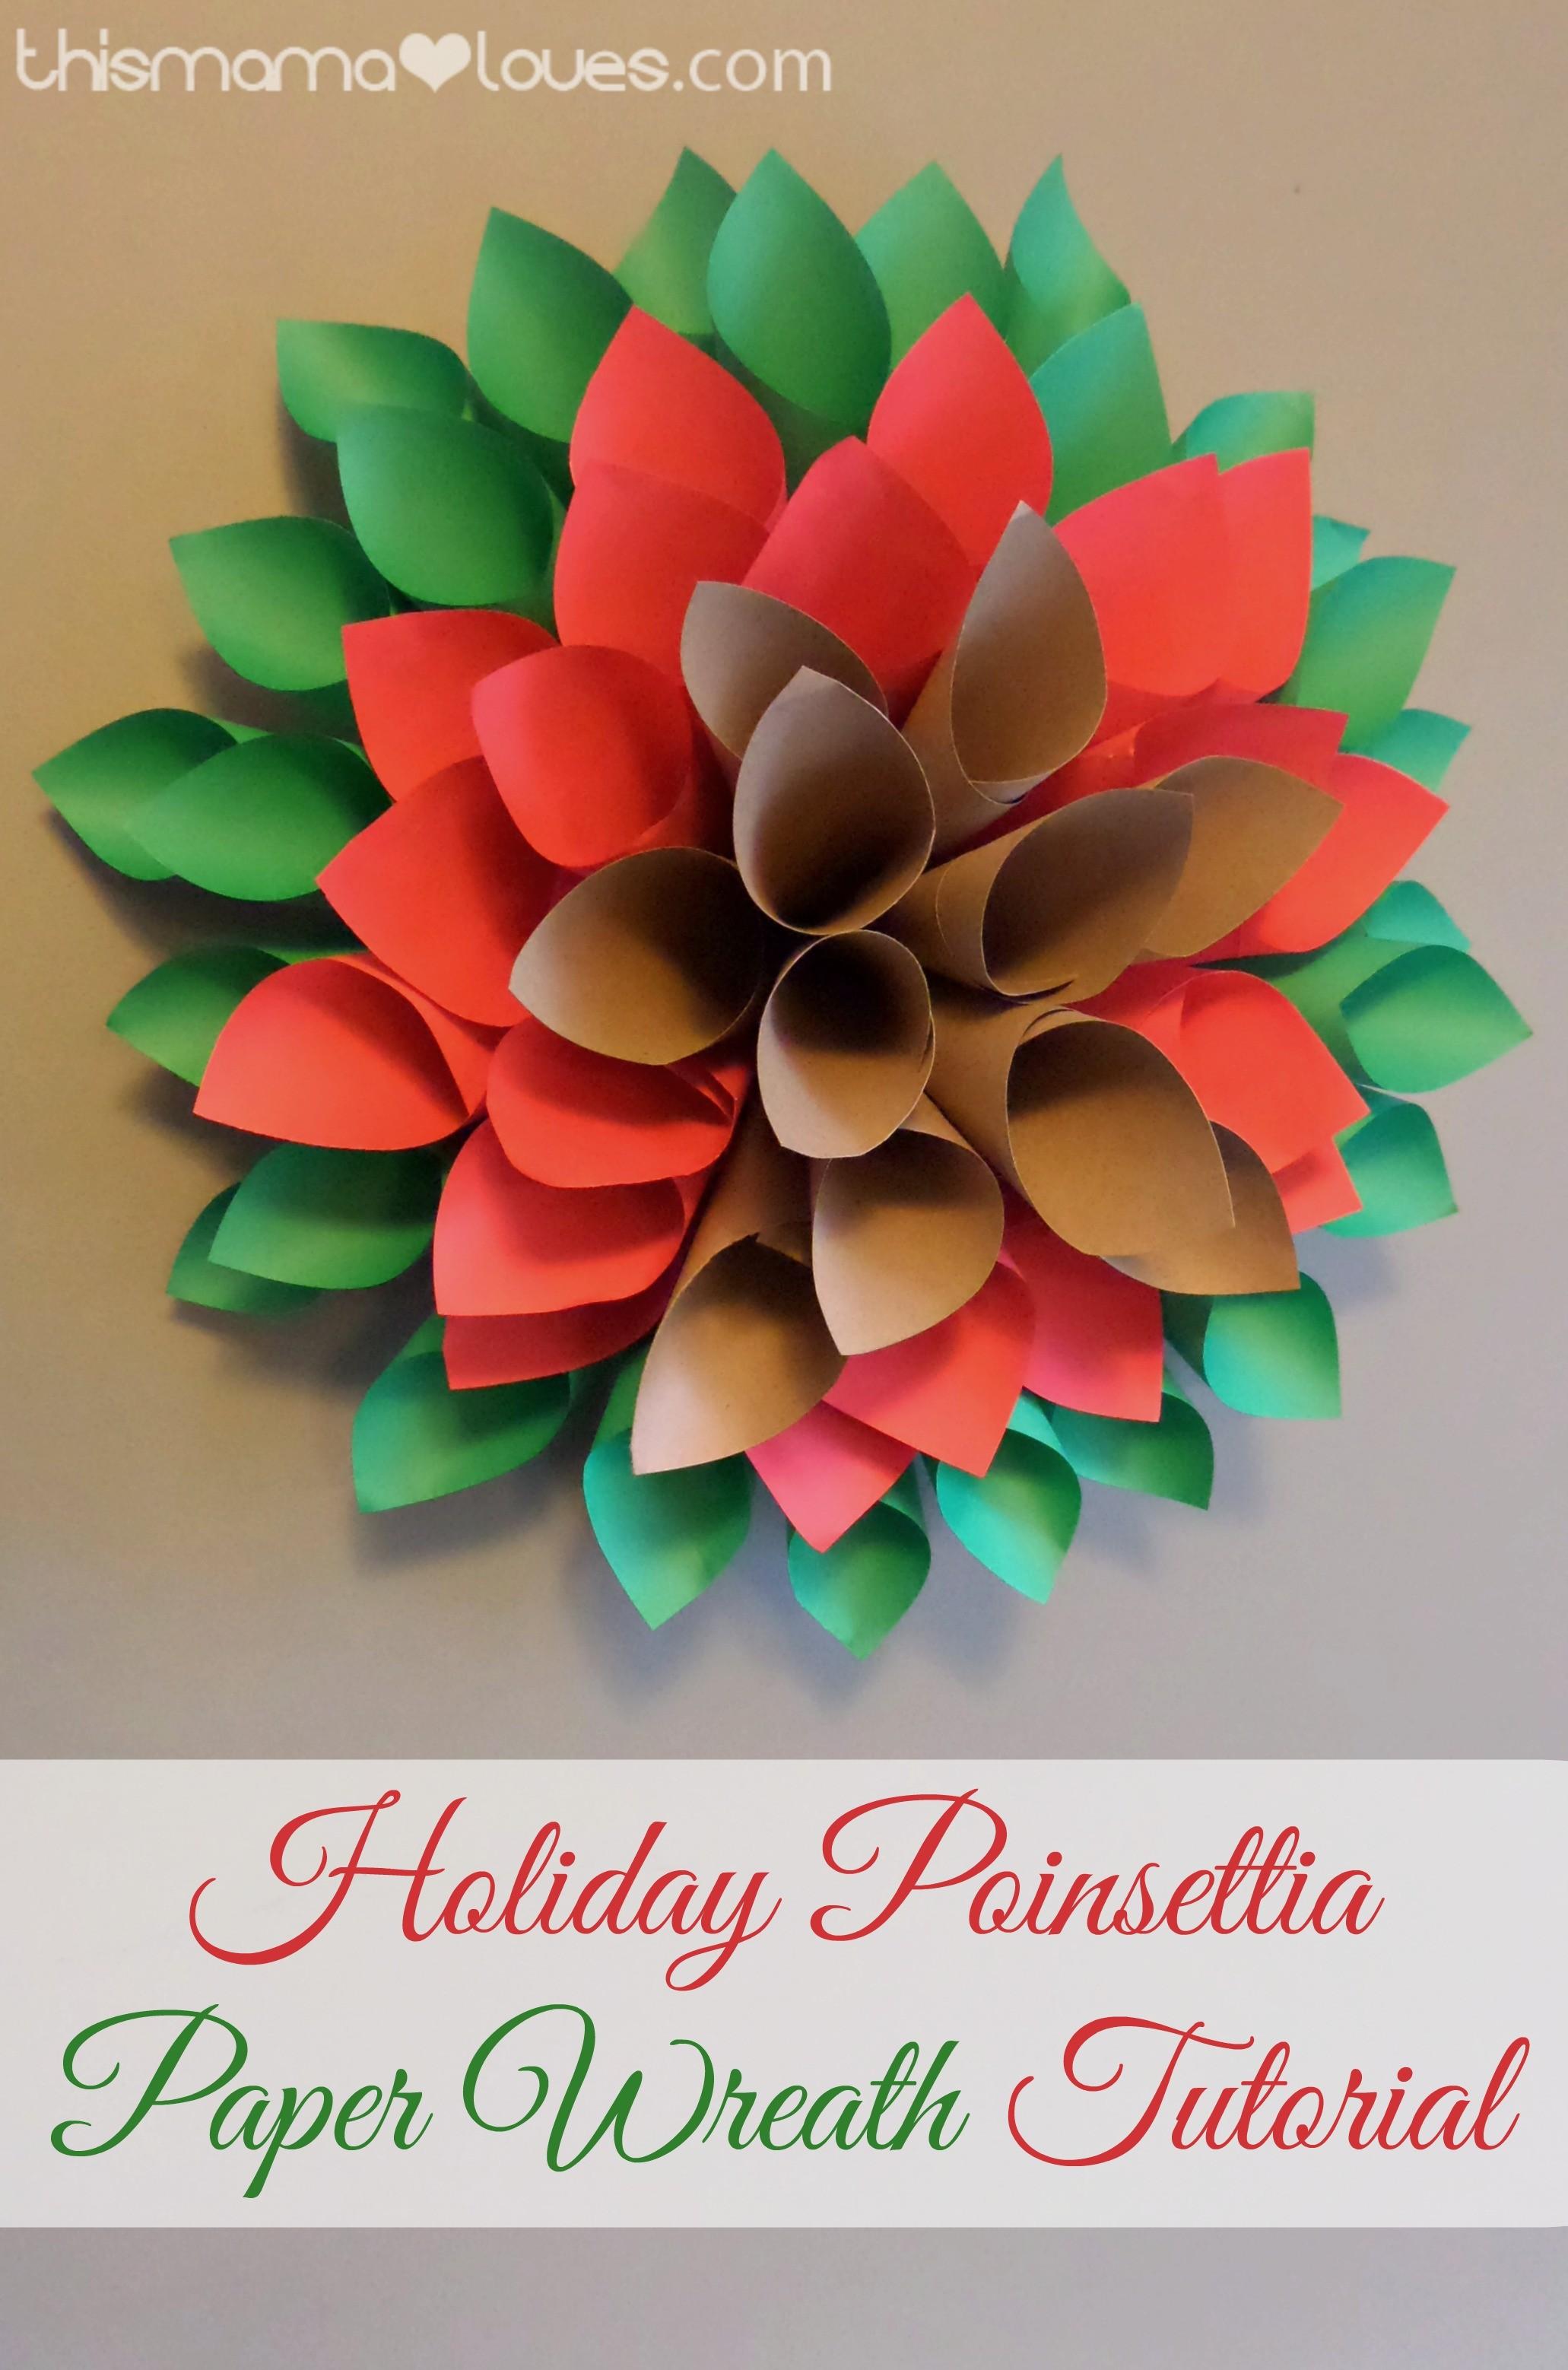 Holiday Poinsettia Paper Wreath Tutorial